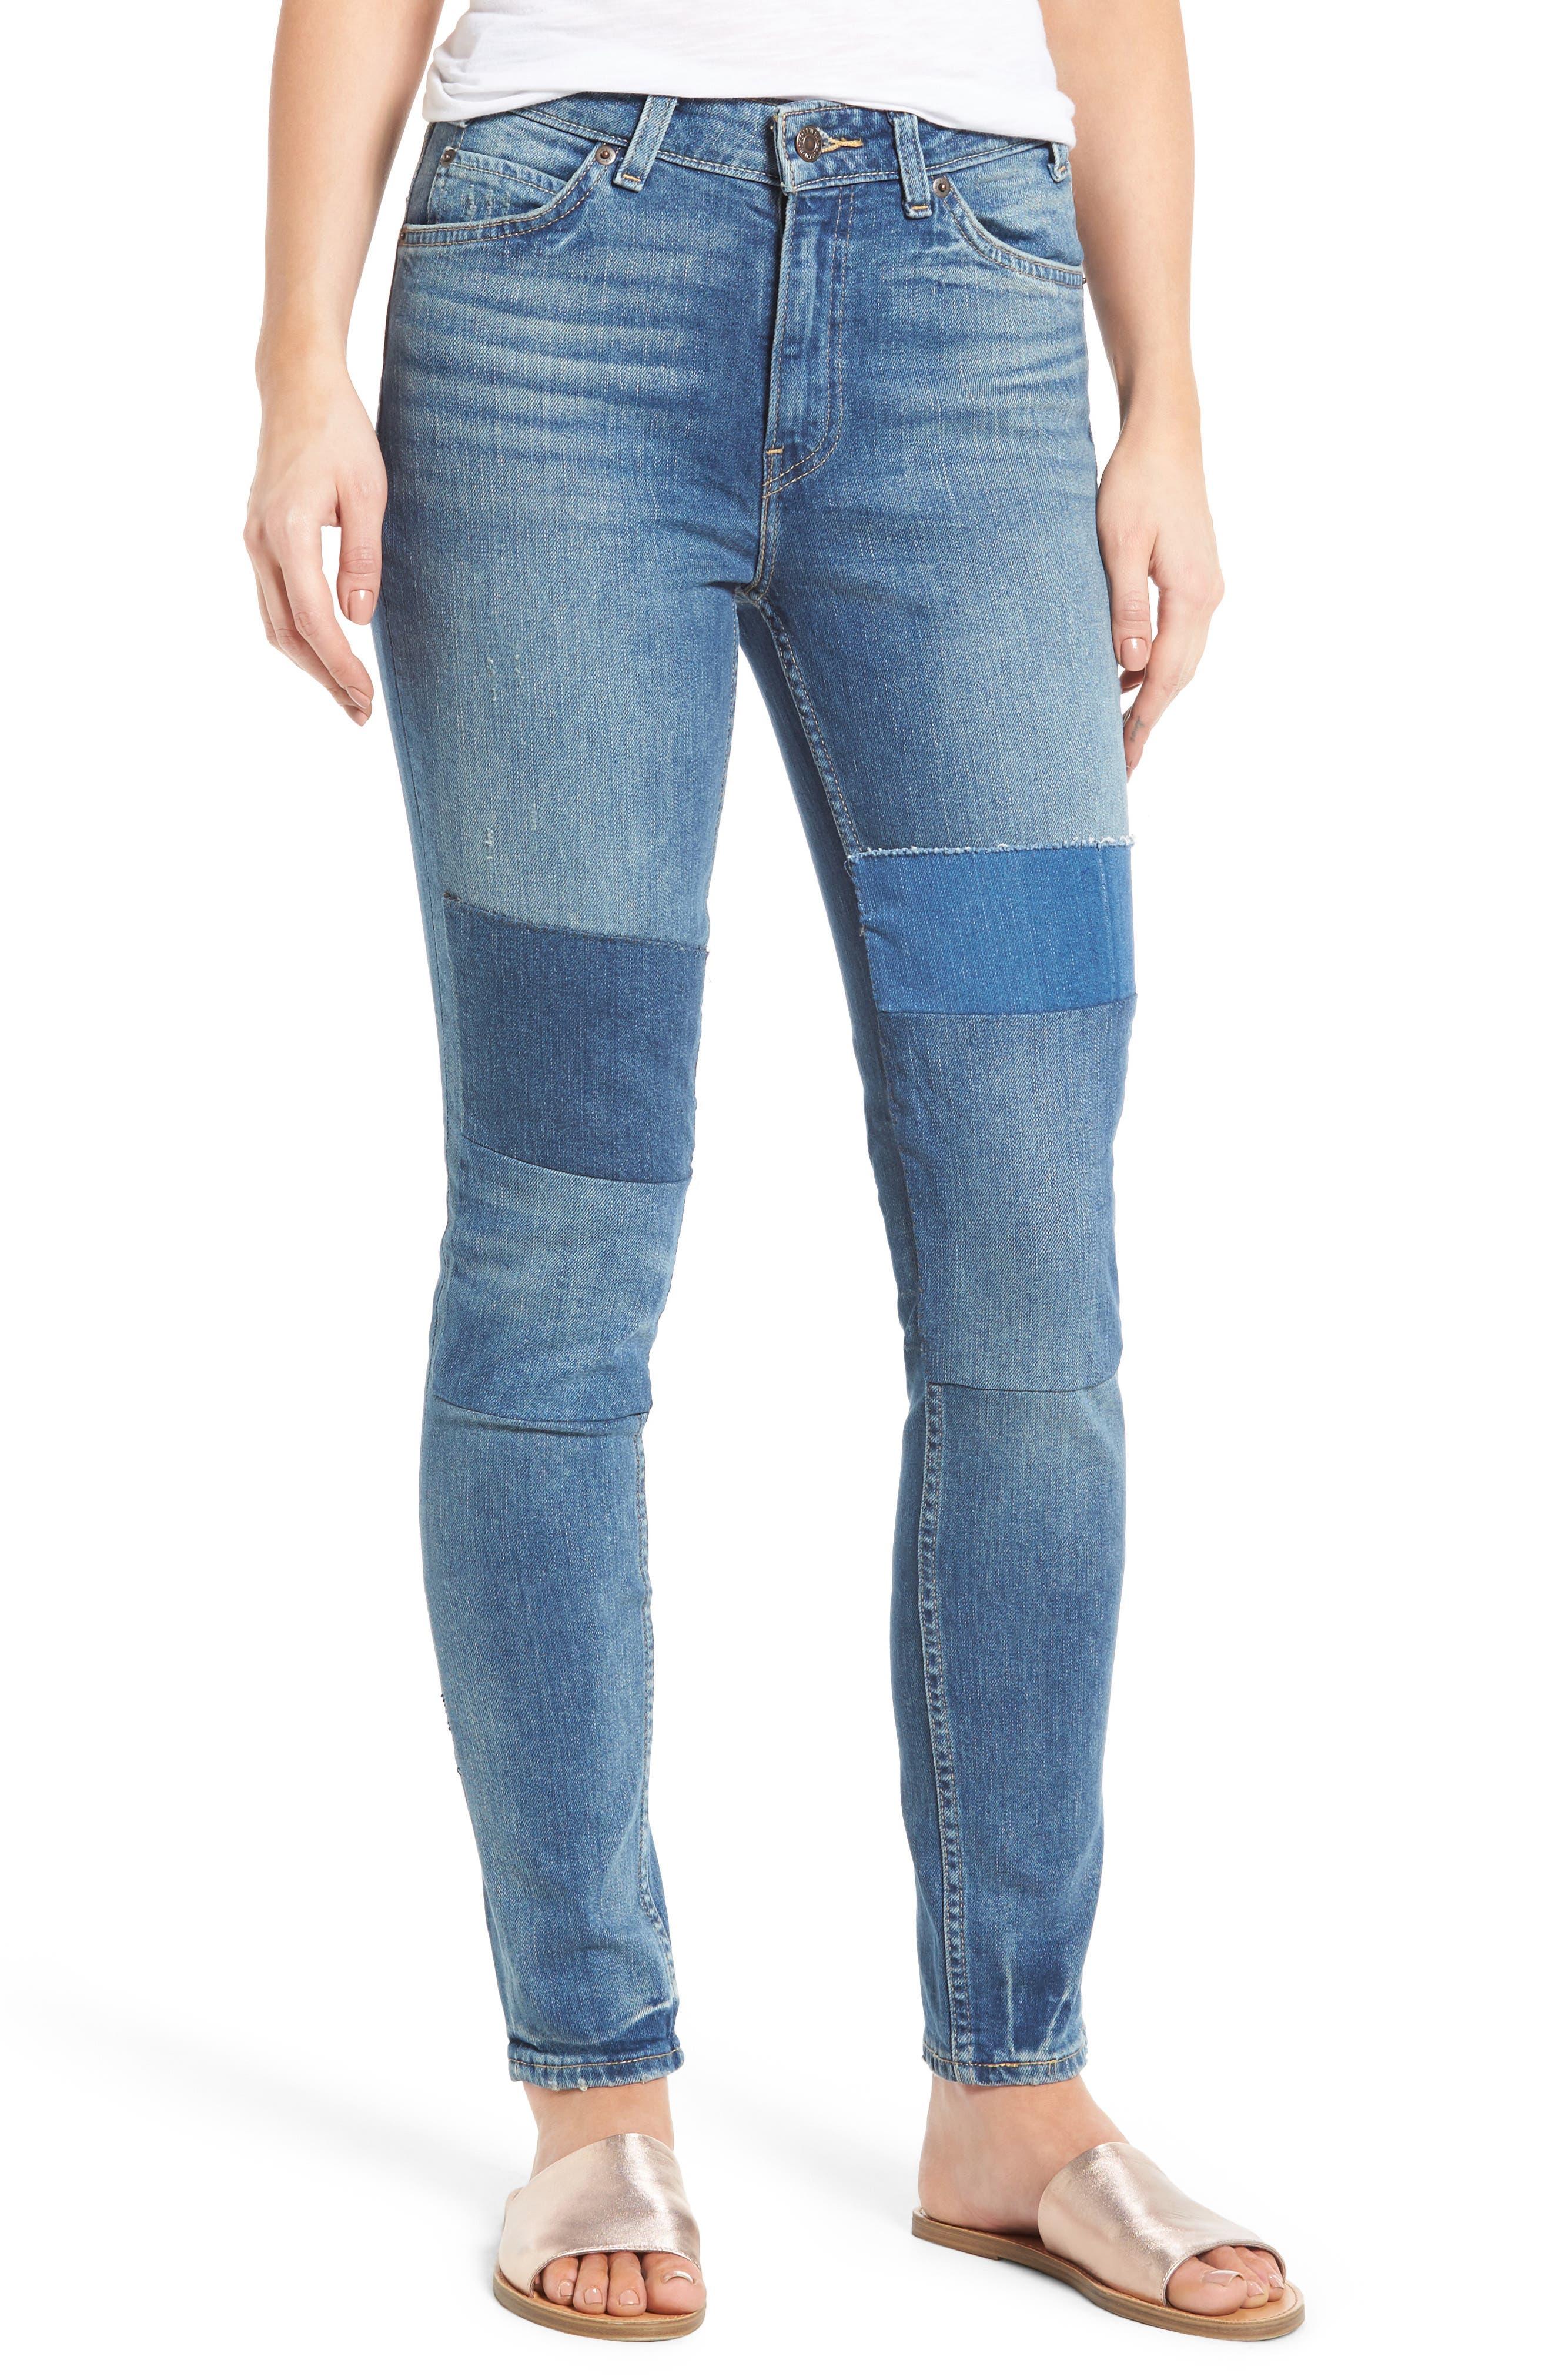 Levi's® Orange Tab 721 Vintage High Waist Skinny Jeans | Nordstrom